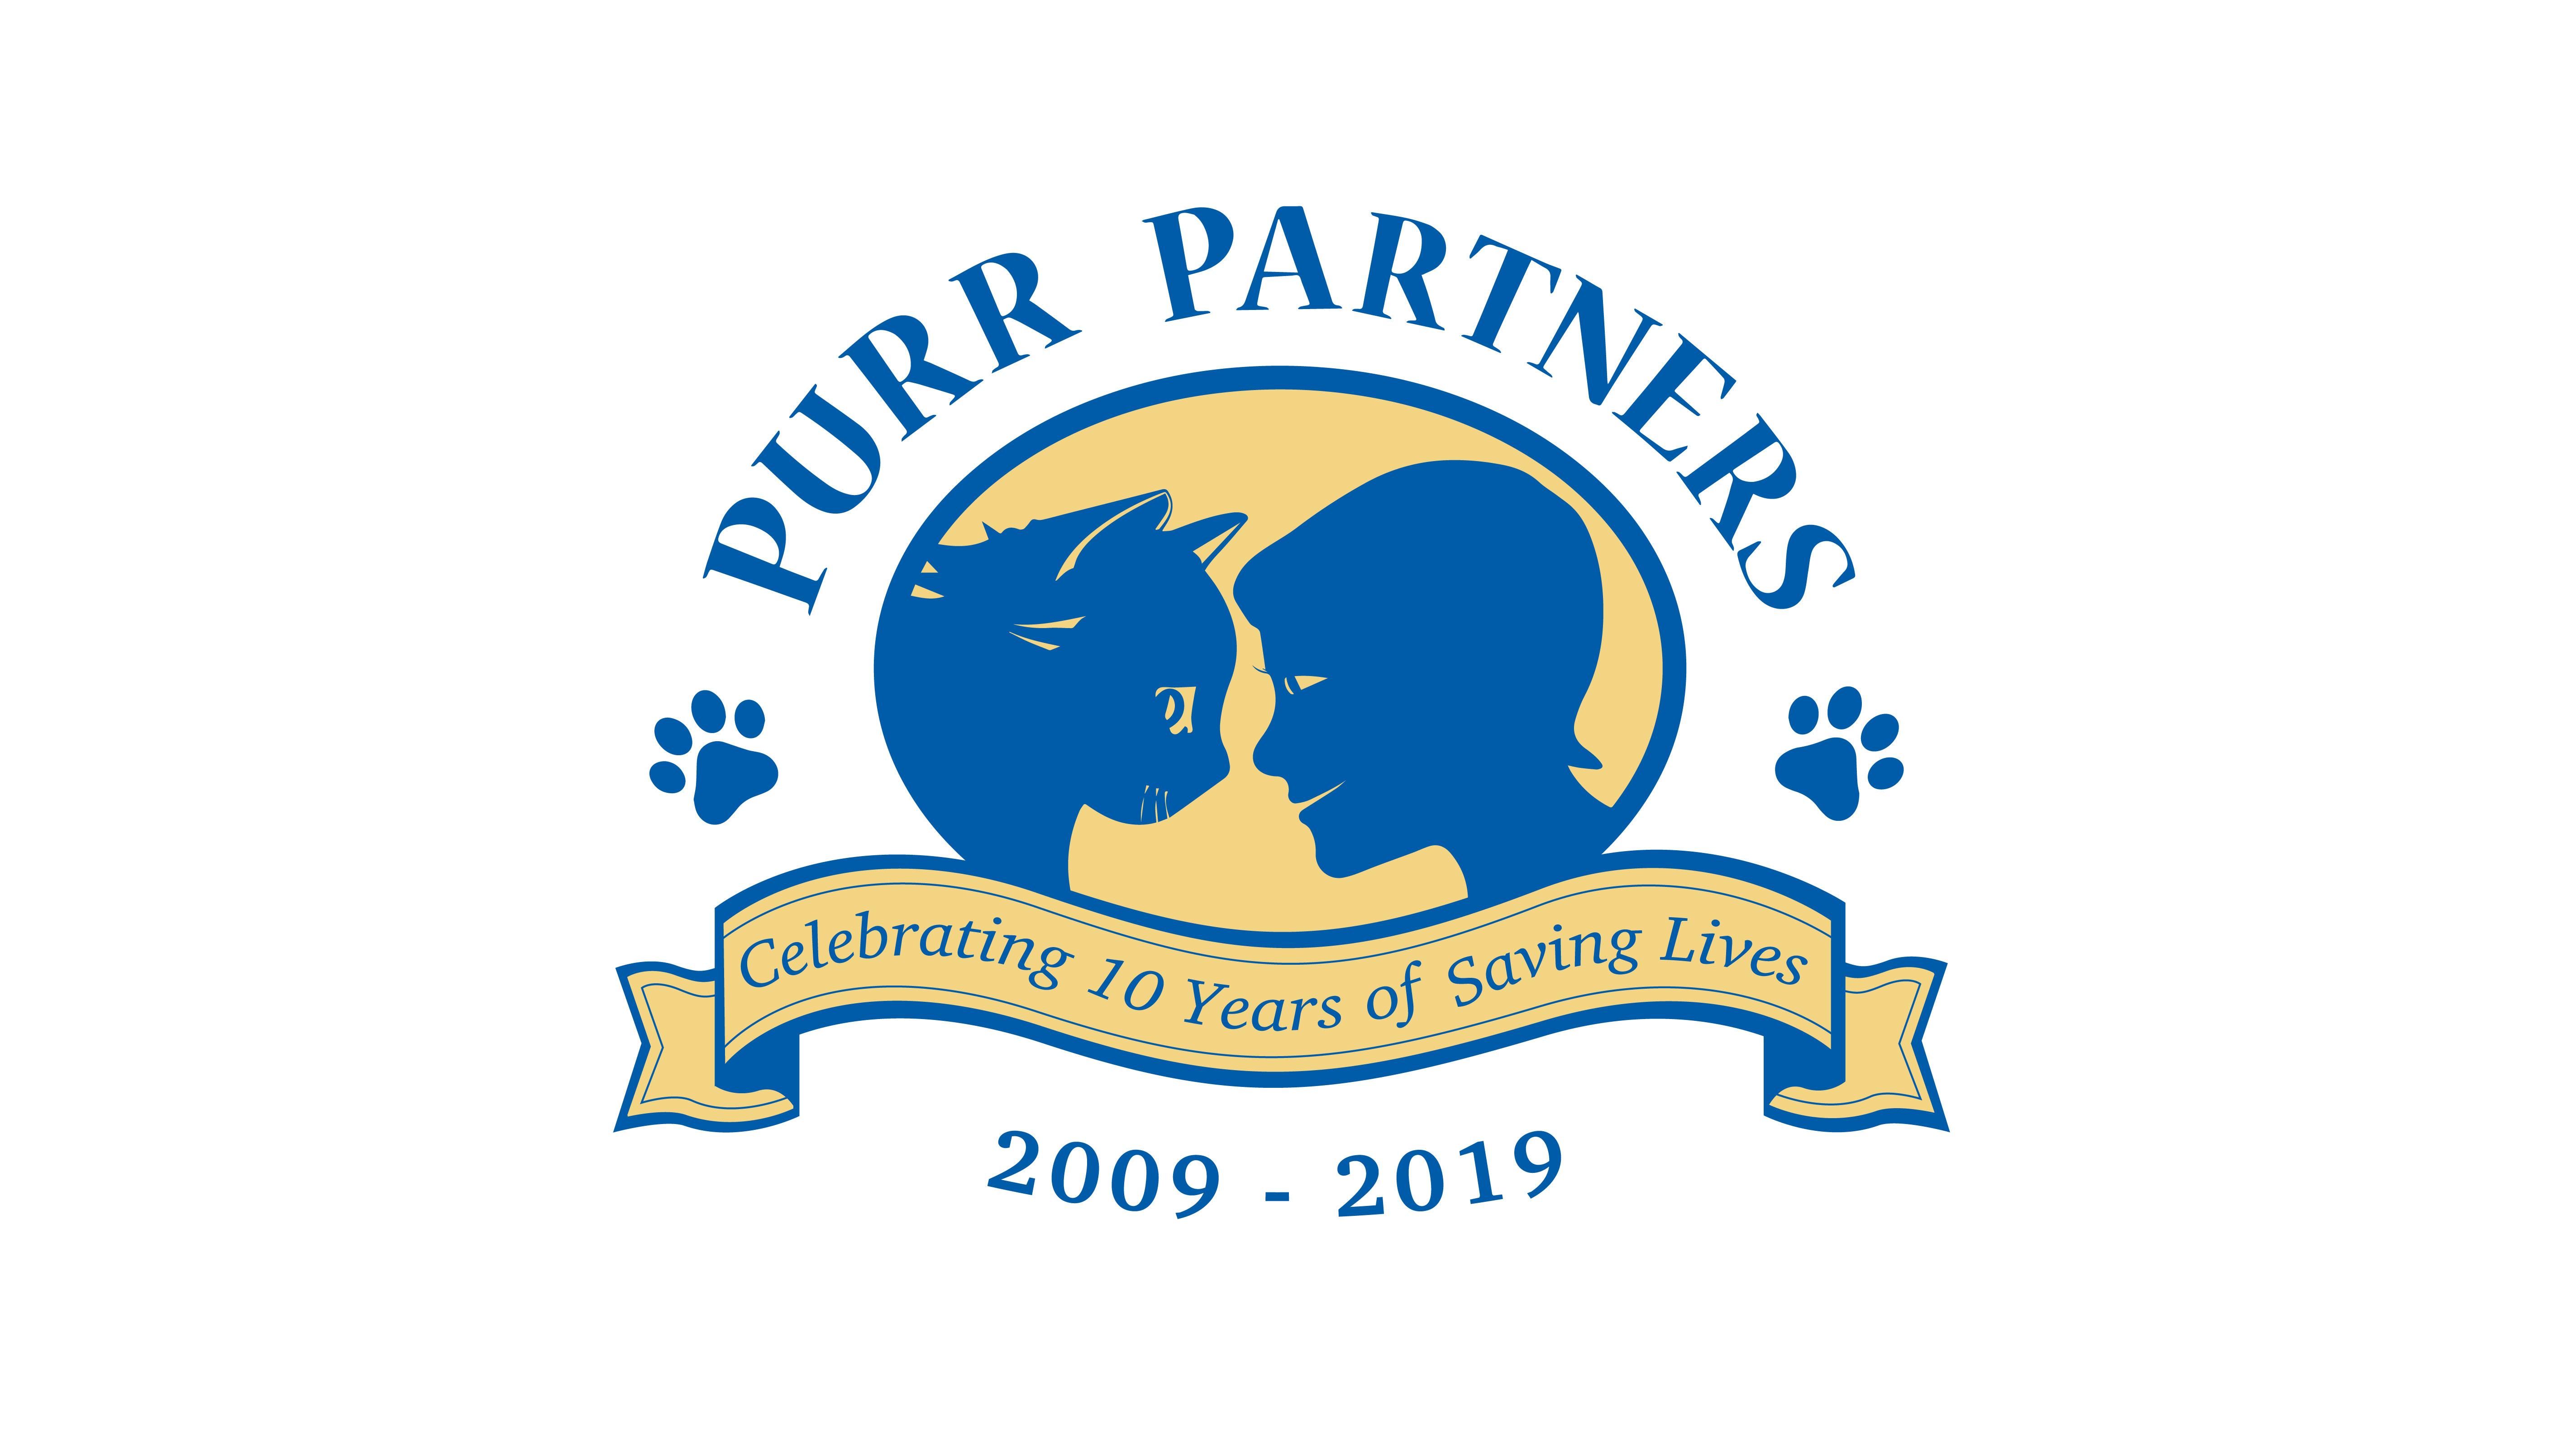 Purr Partners